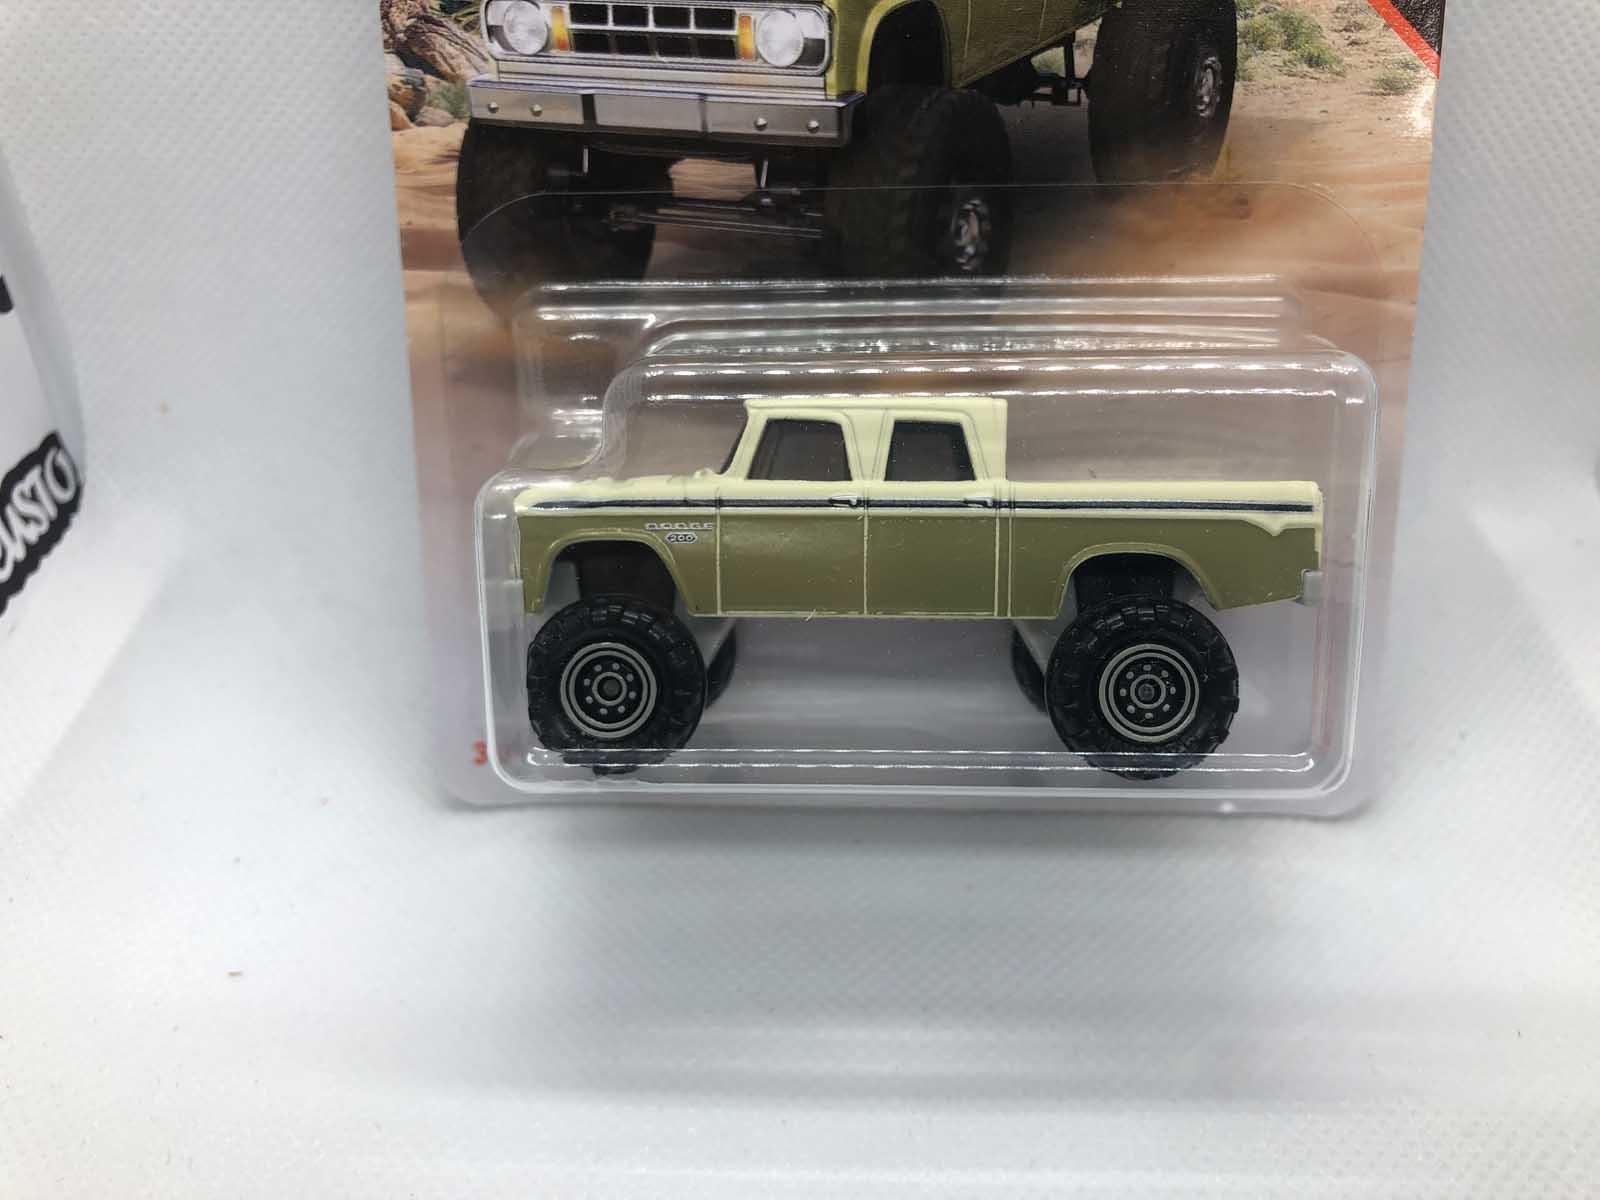 68 Dodge D-200